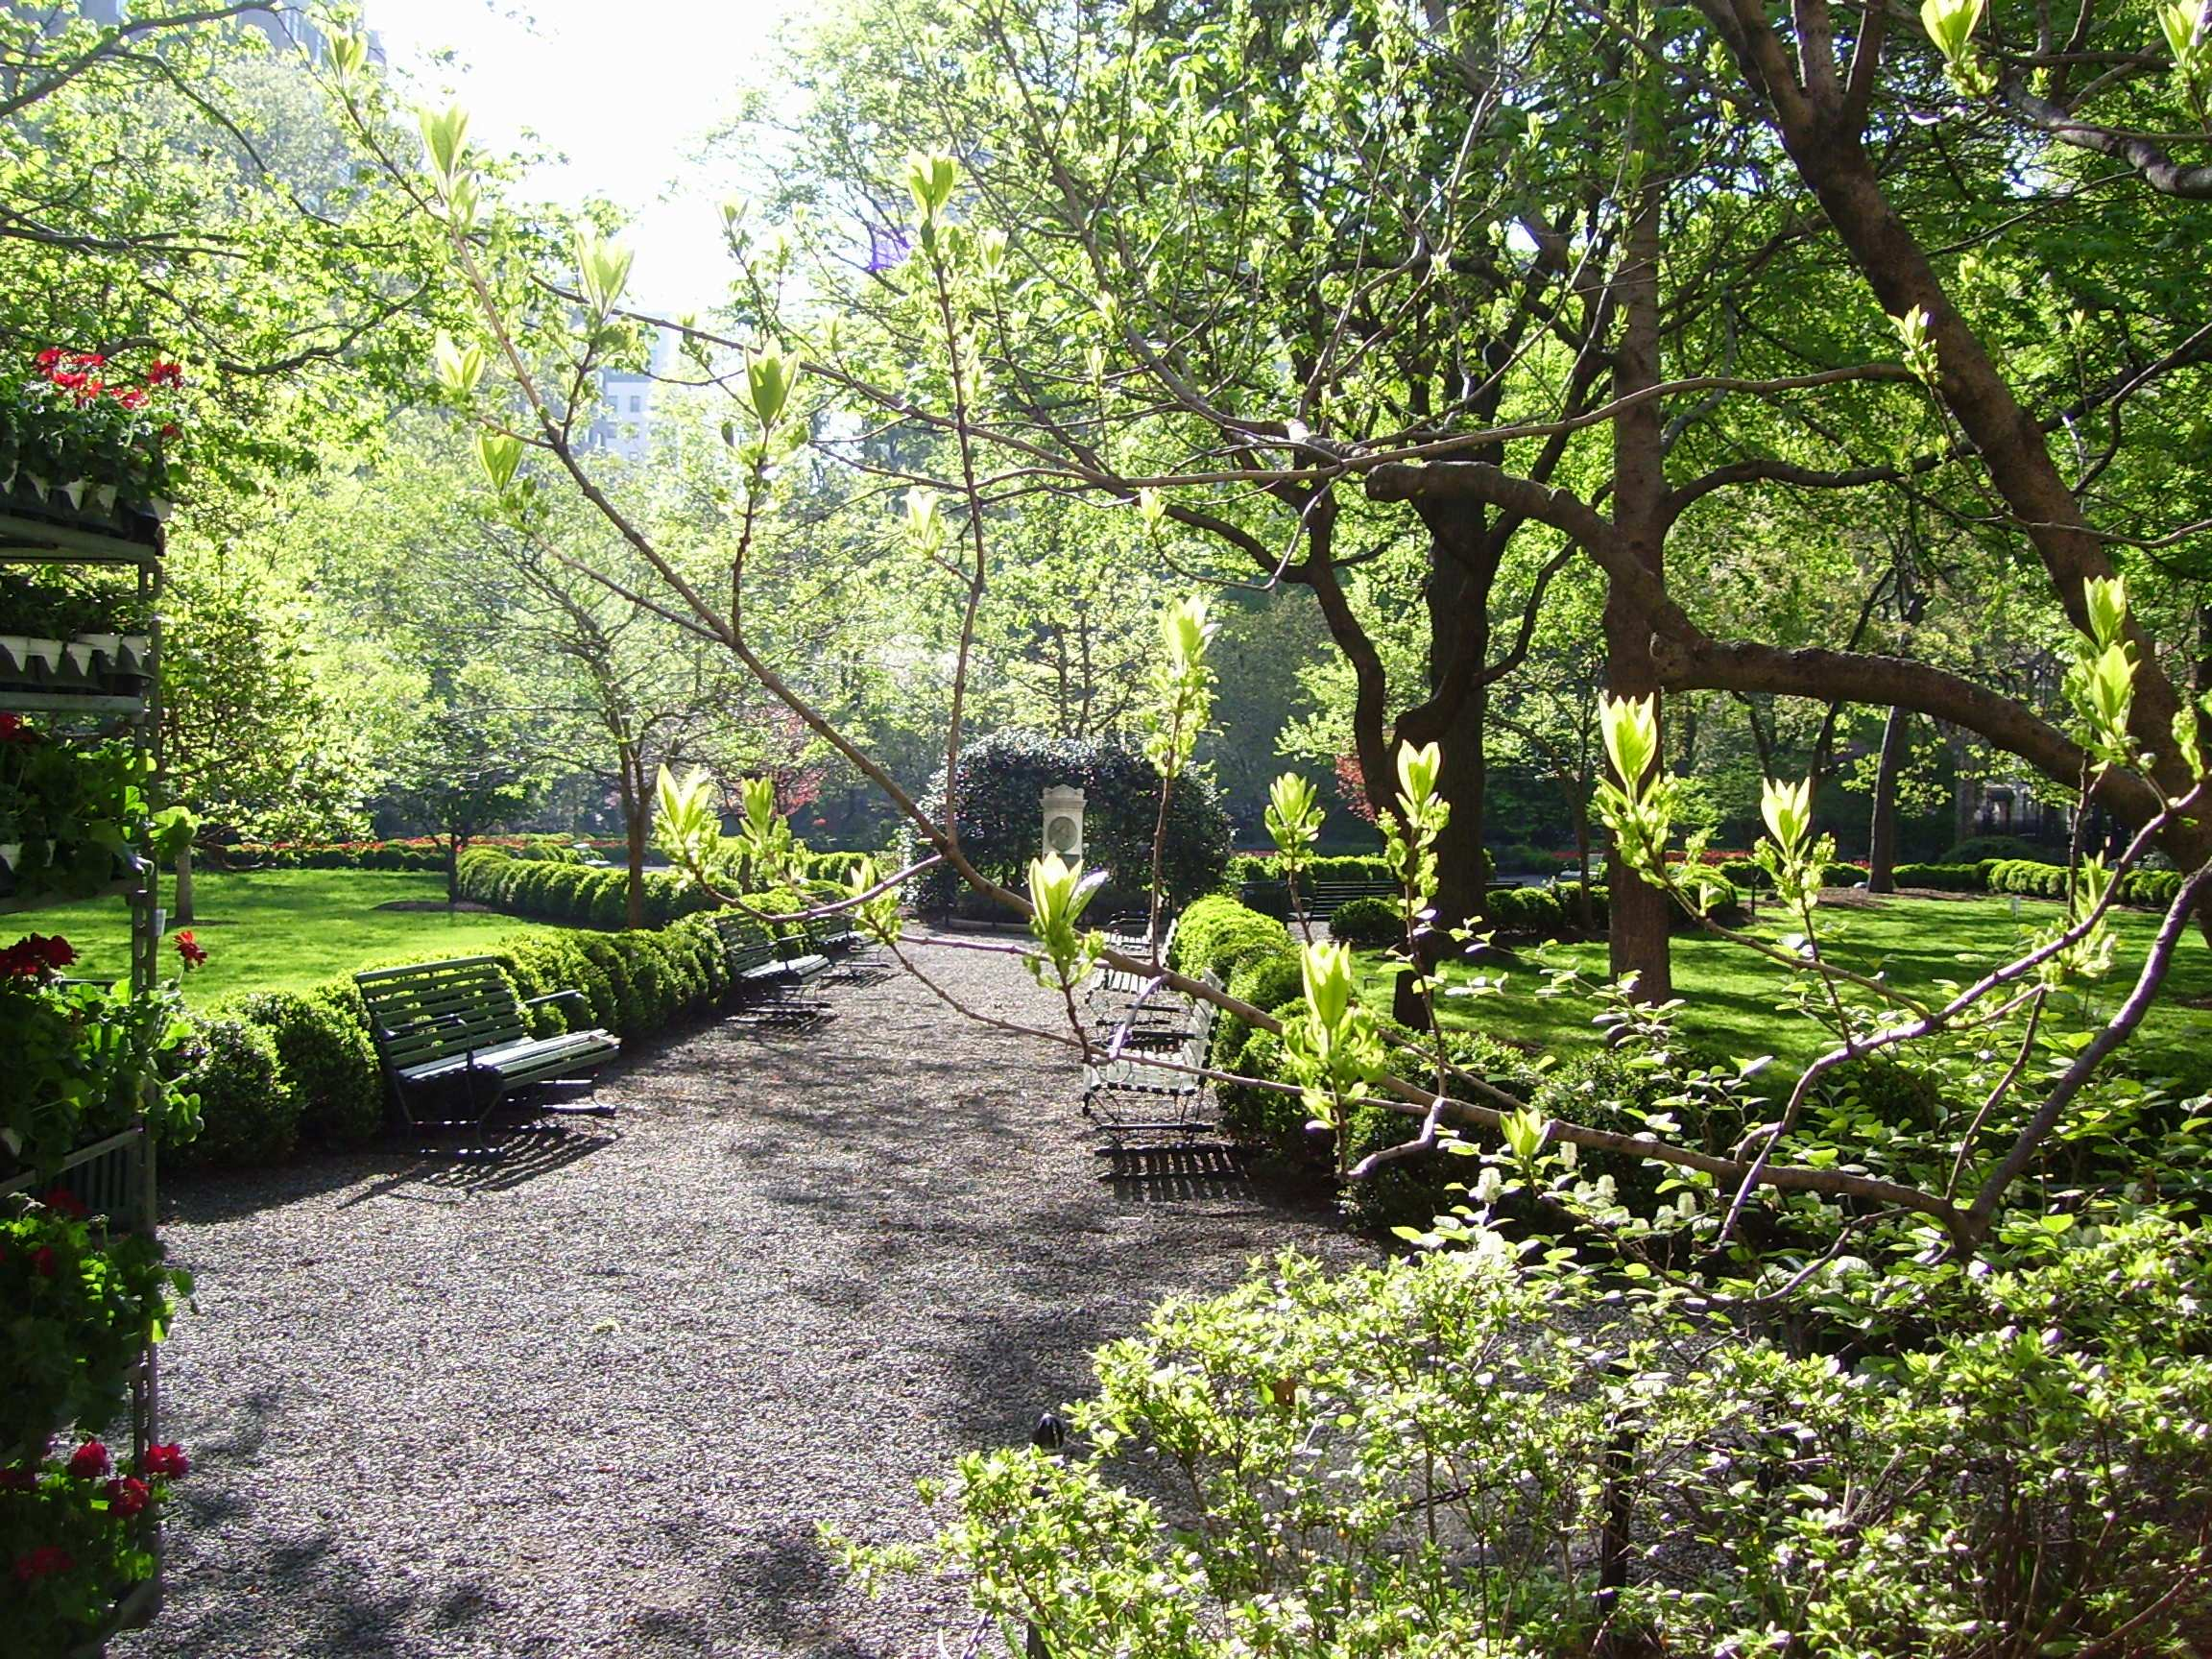 Gramercy_Park_interior_W_gate